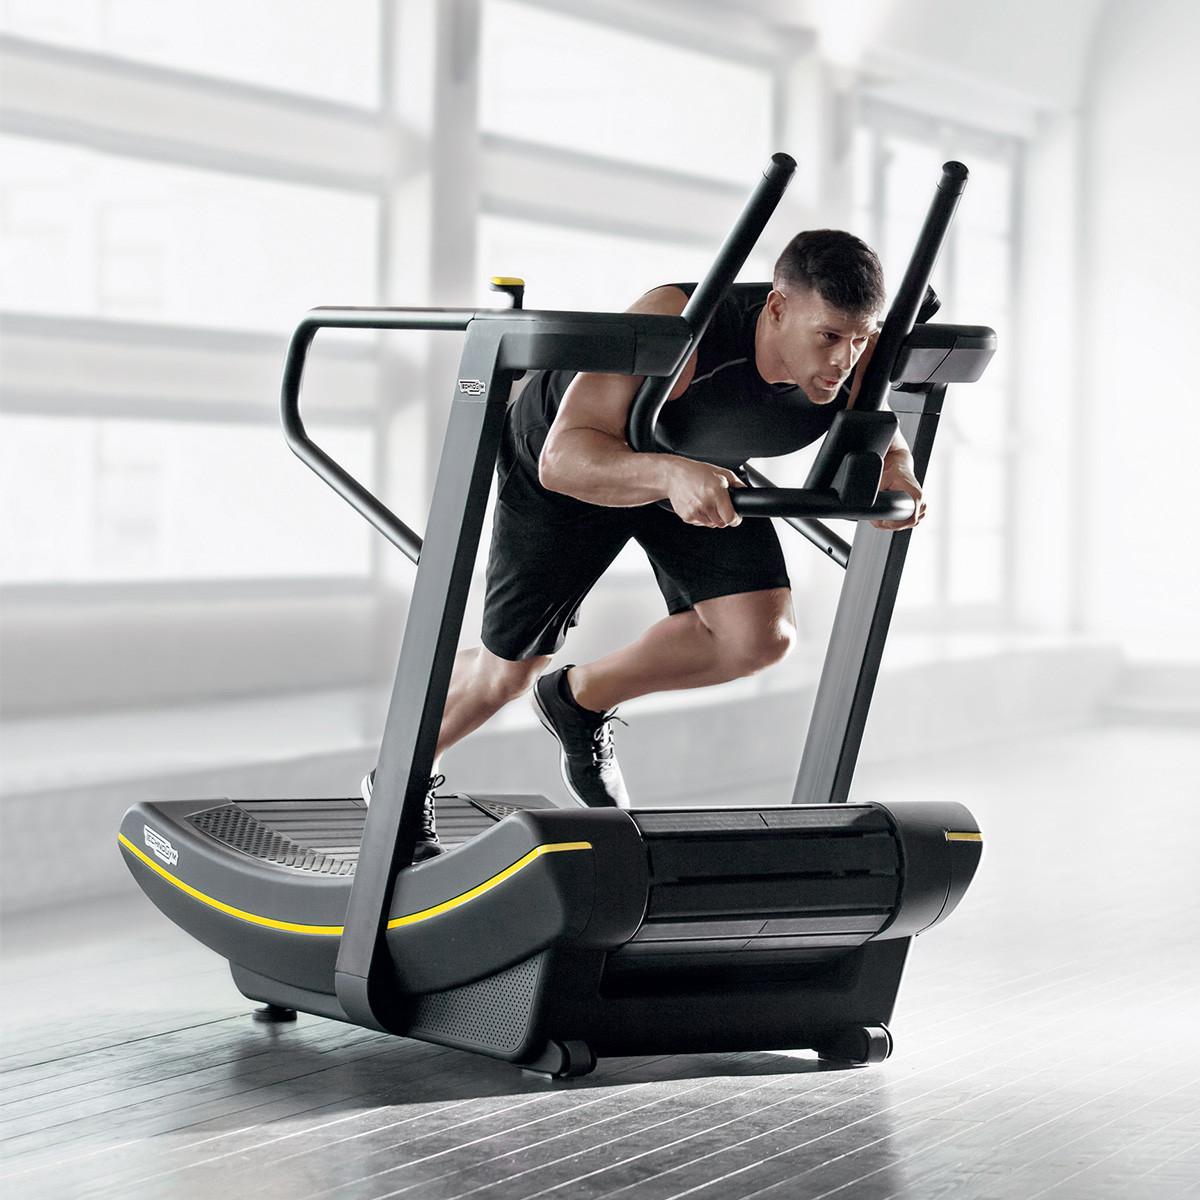 SKILLMILL Connect – Cinta de correr para entrenamiento de alta performance